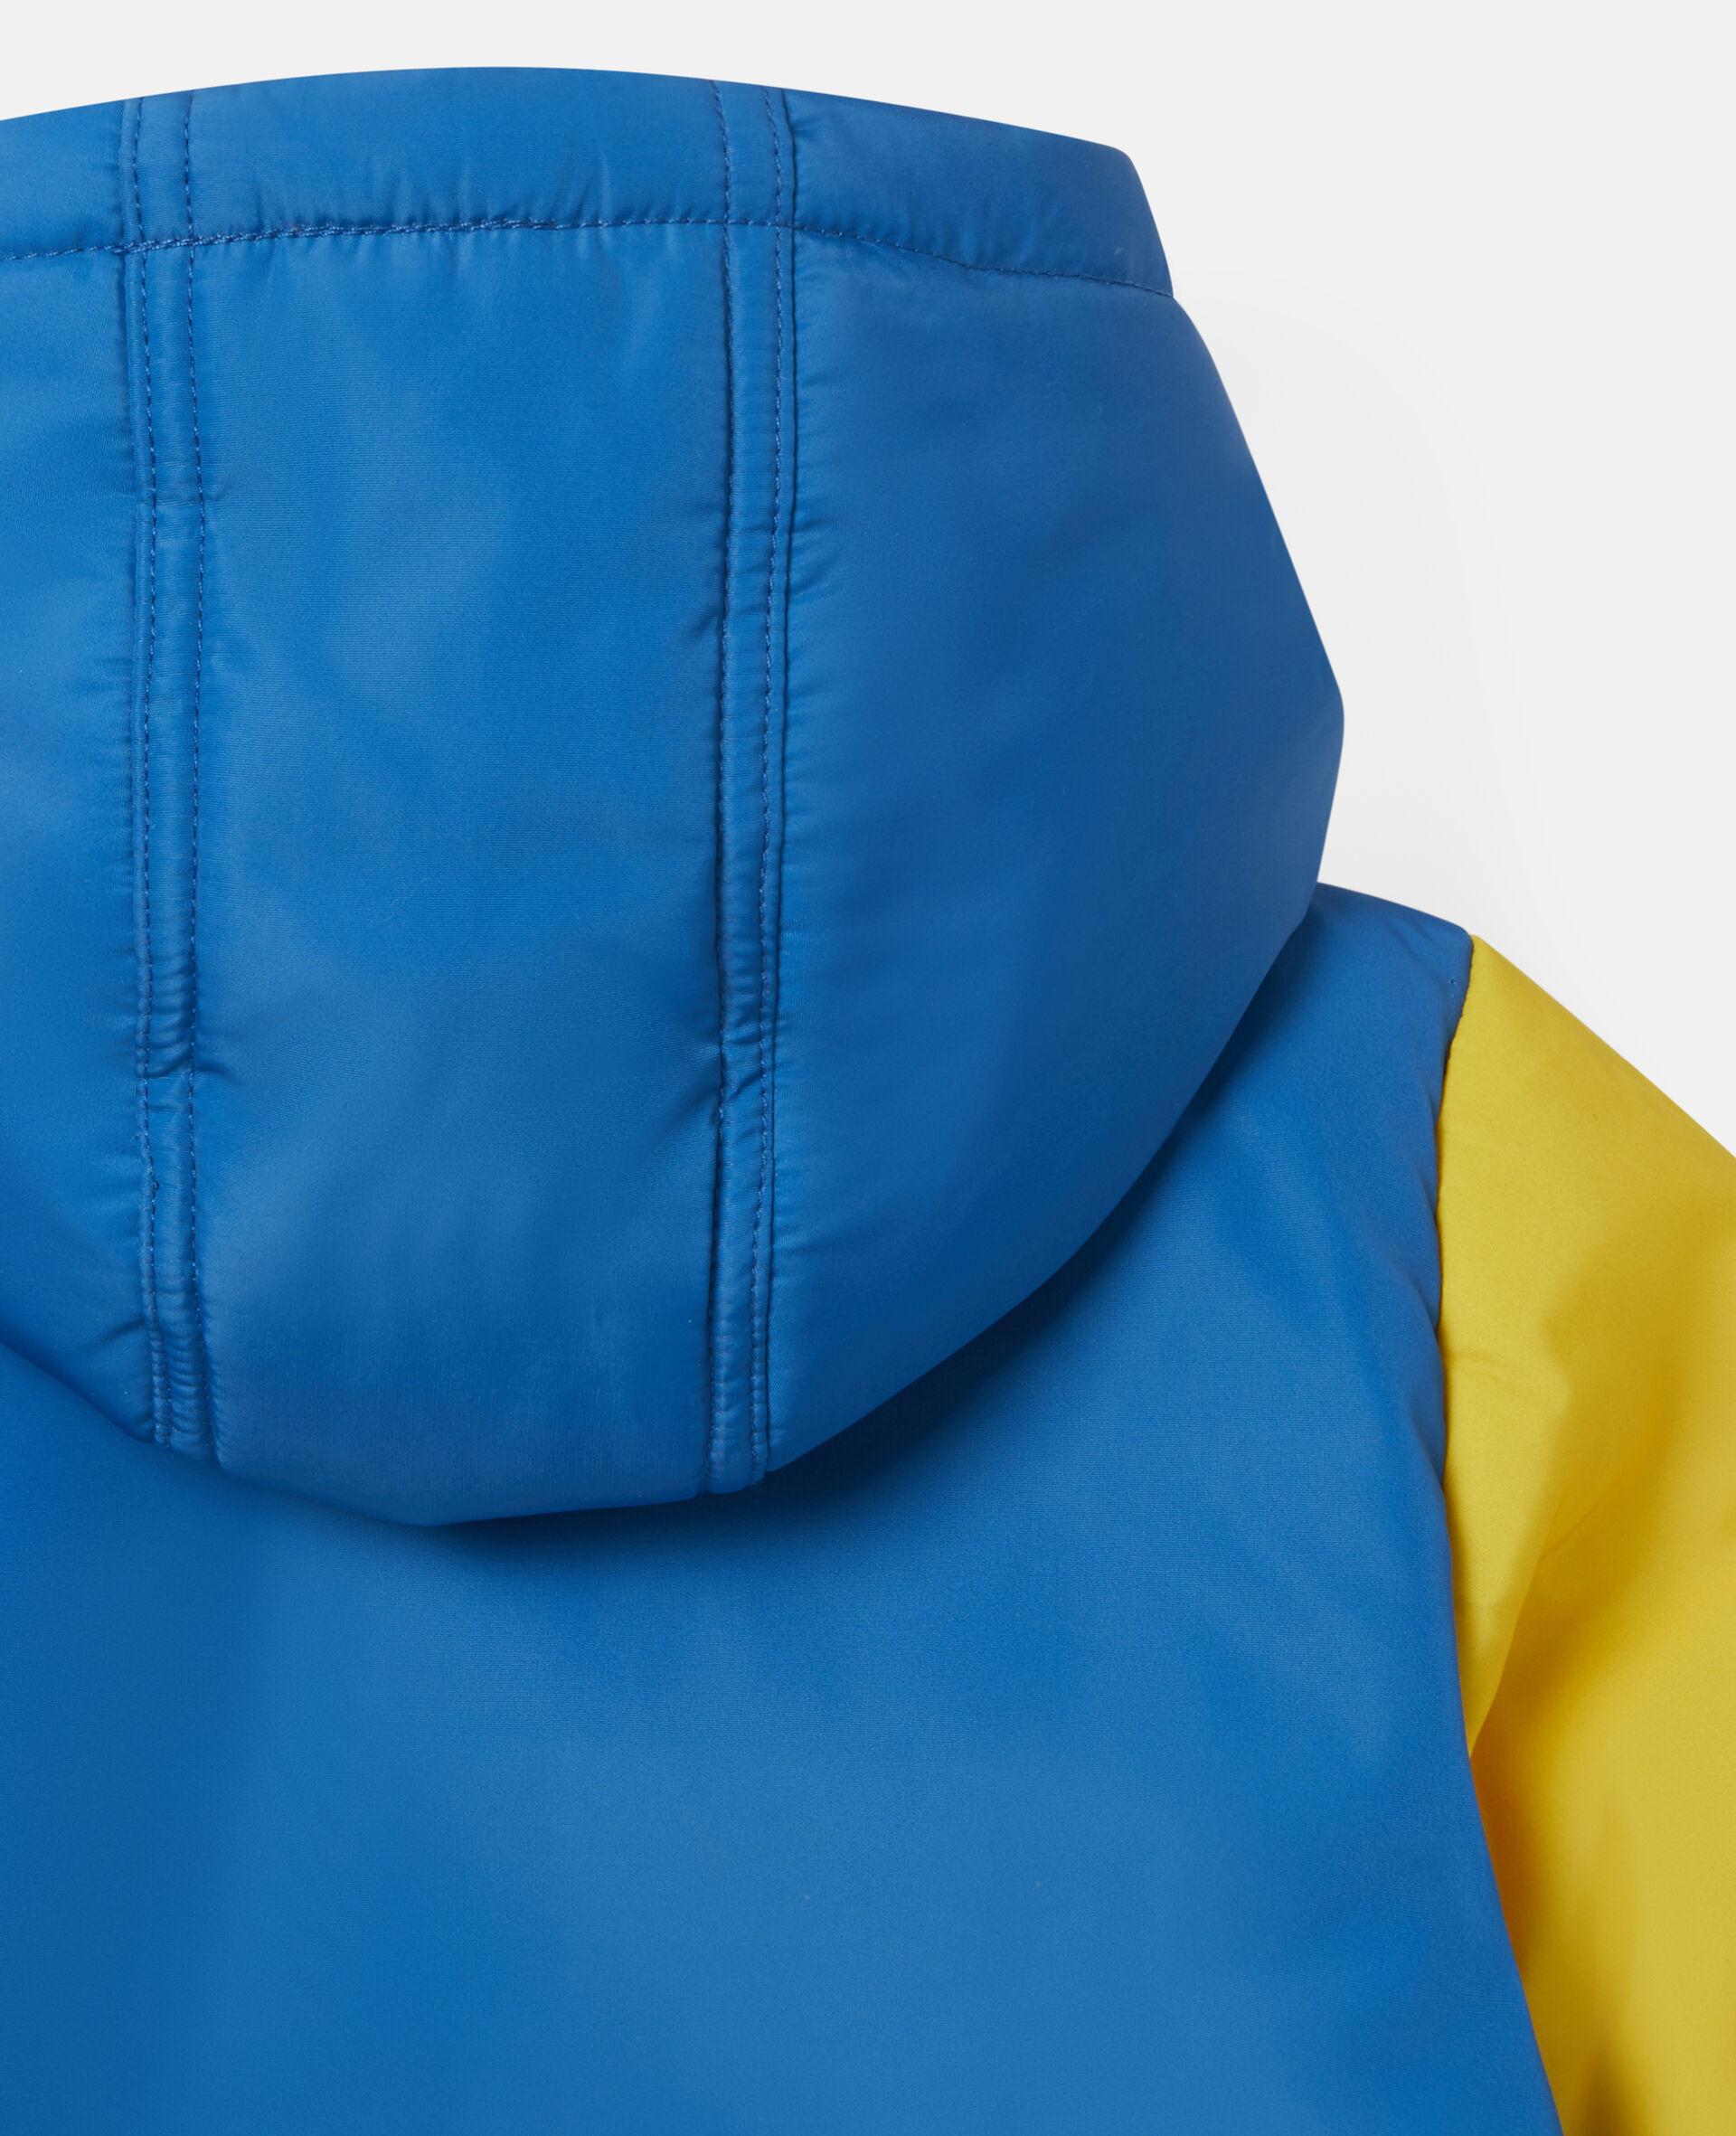 Pufferjacke in Blockfarben-Design mit Stifte-Motiv-Bunt-large image number 2